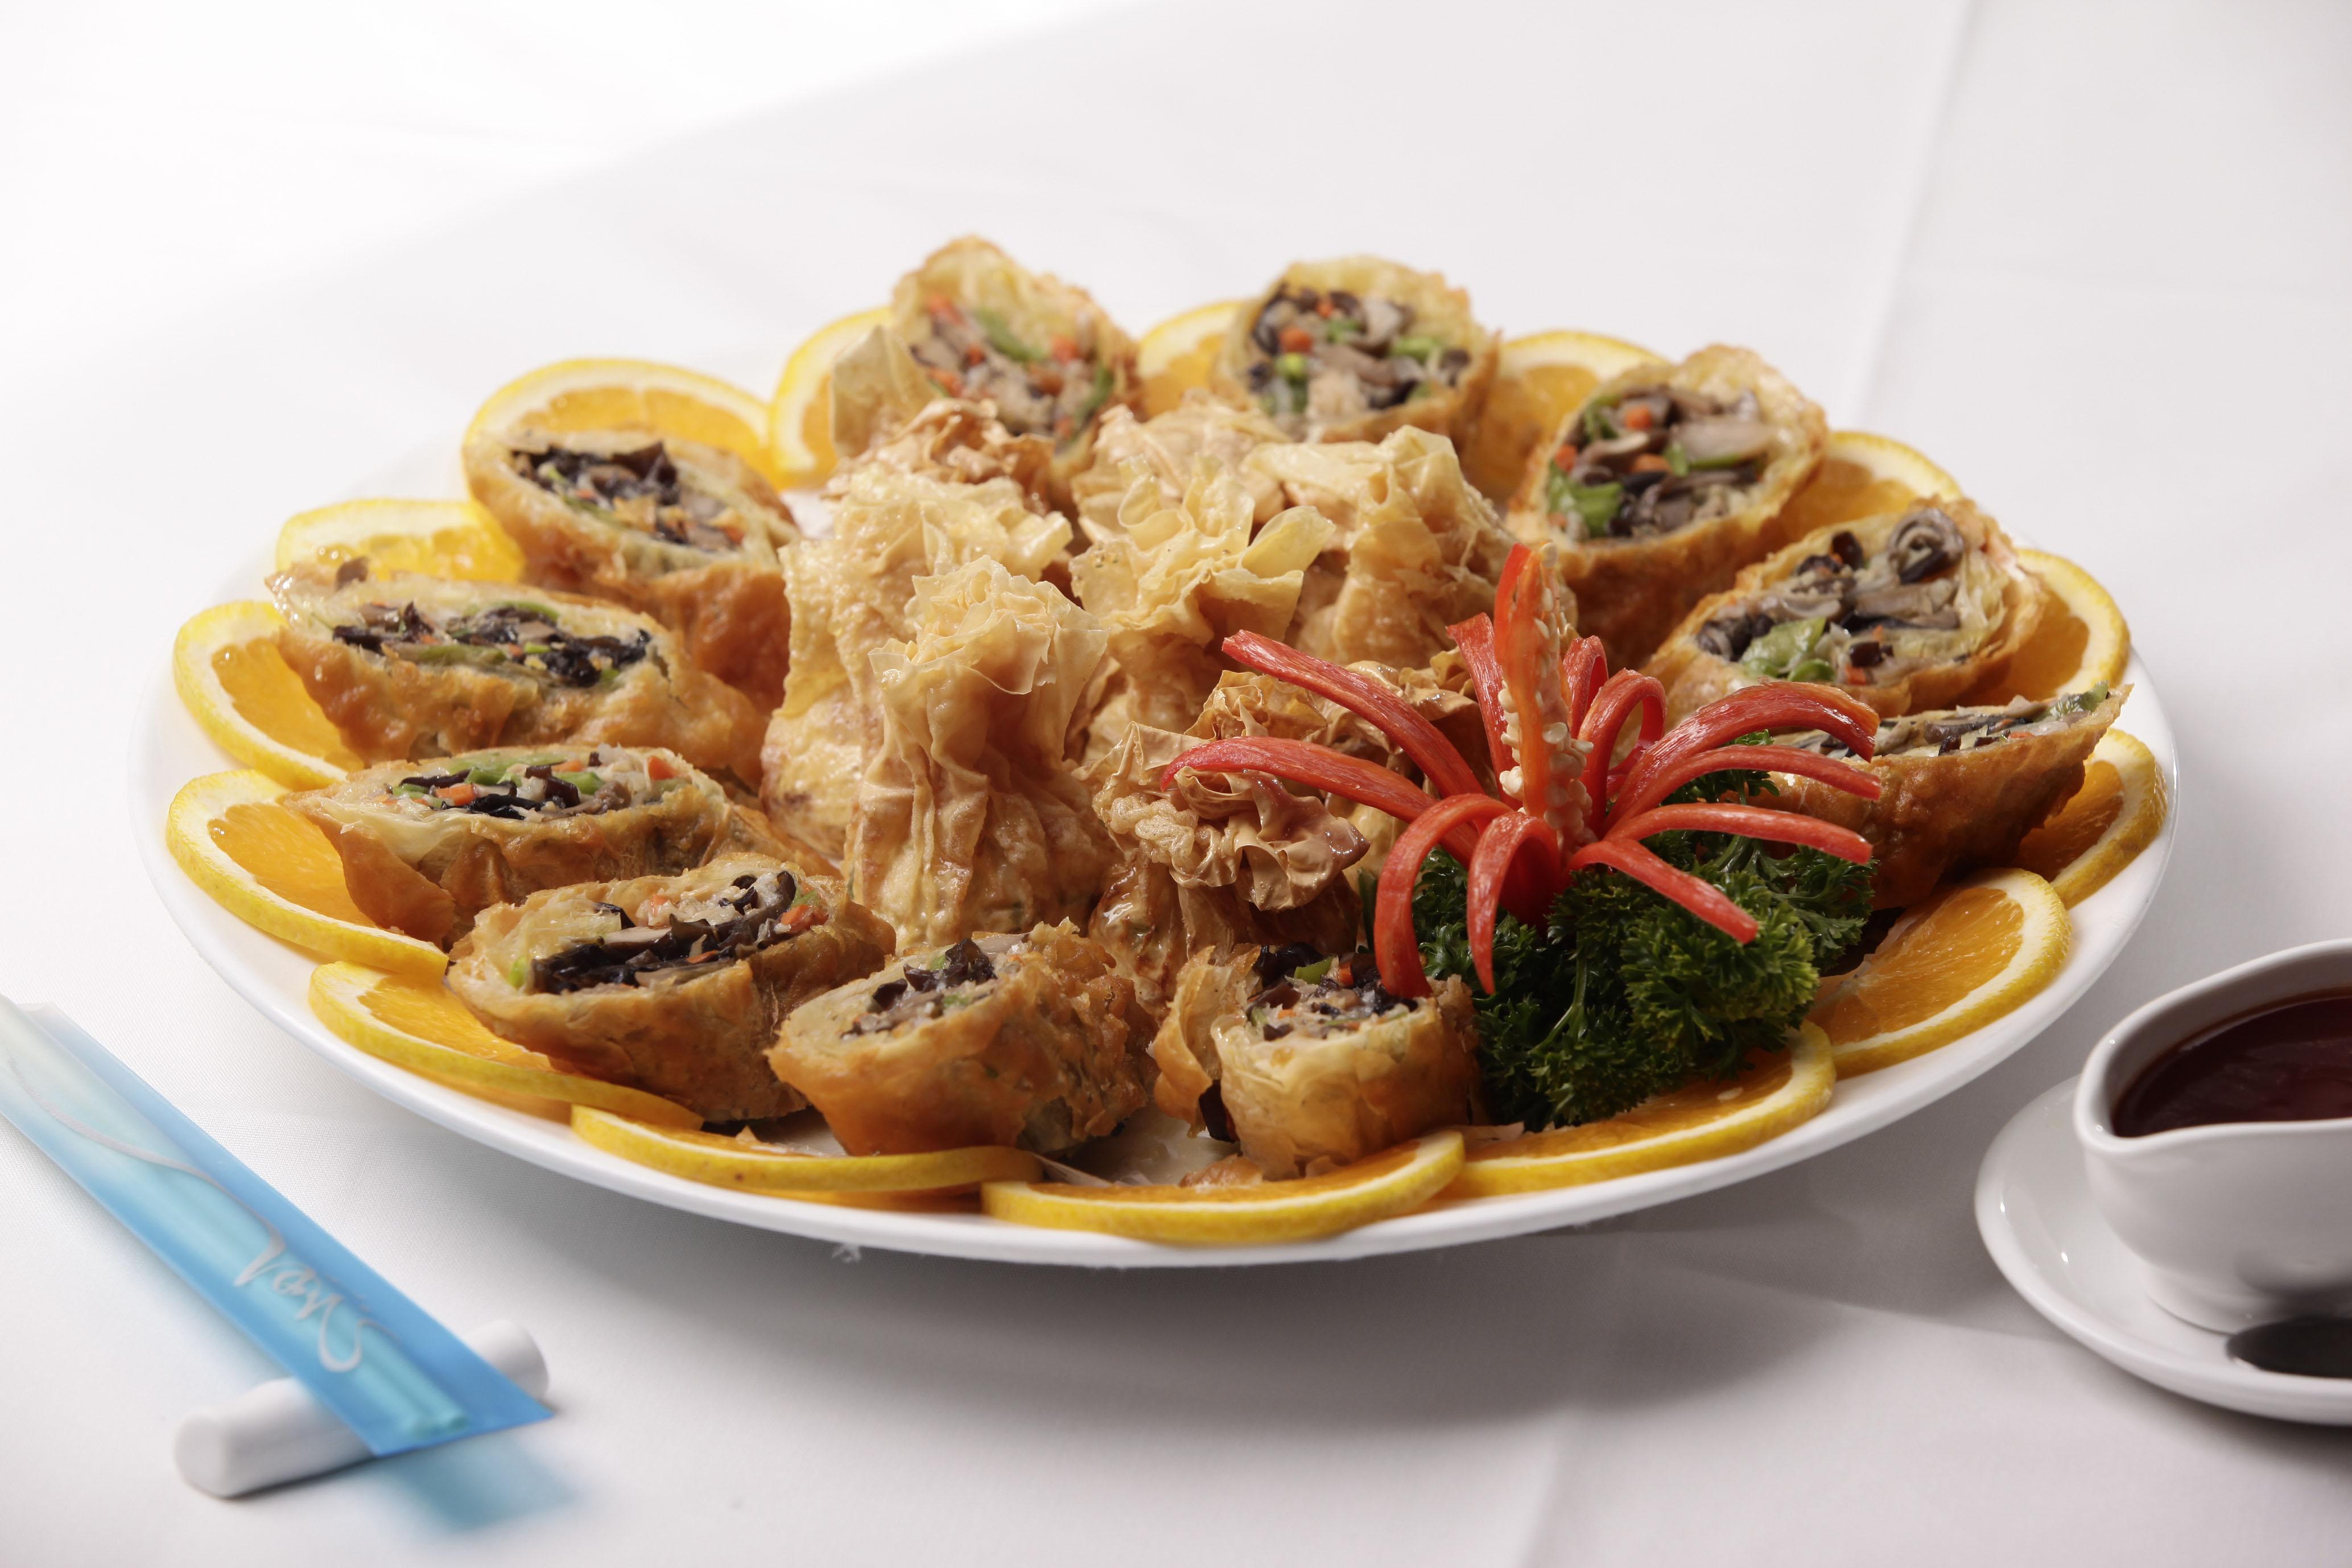 Aquarium Seafood Chinese Restaurant In Ascot Perth Wa